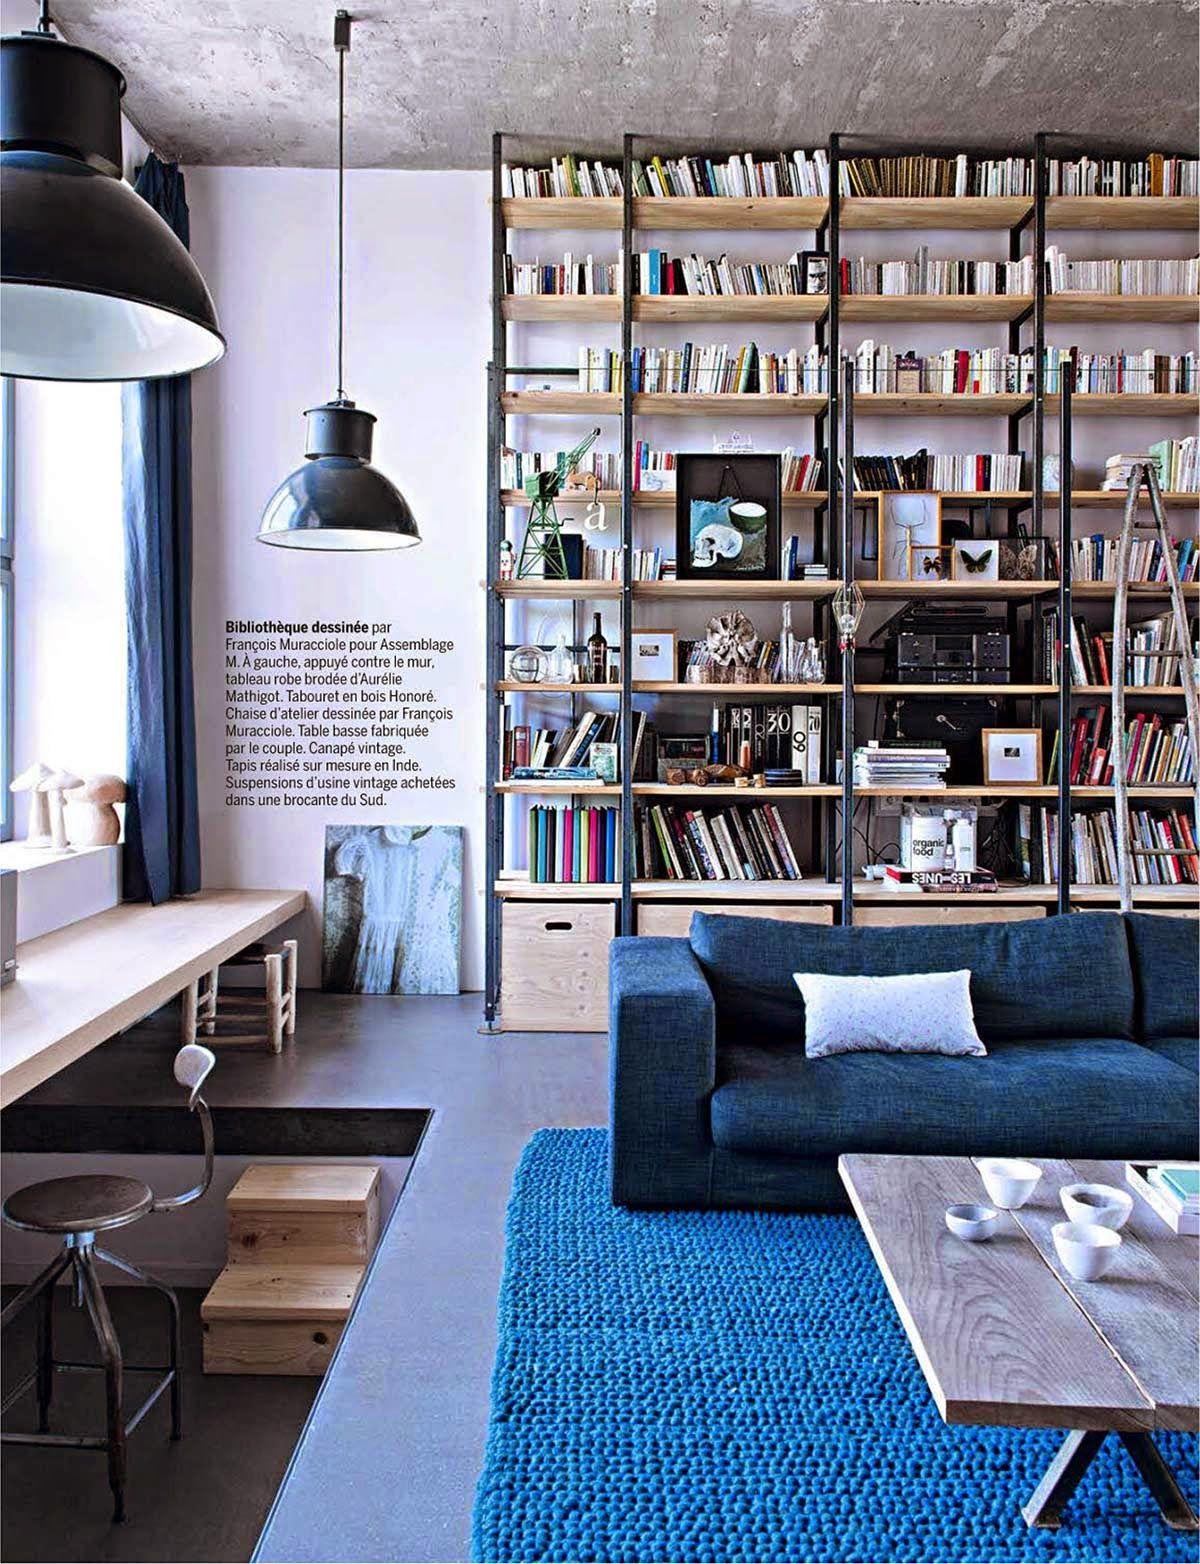 Um Loft Perfeito E Quentinho Library Paradise Pinterest Lofts